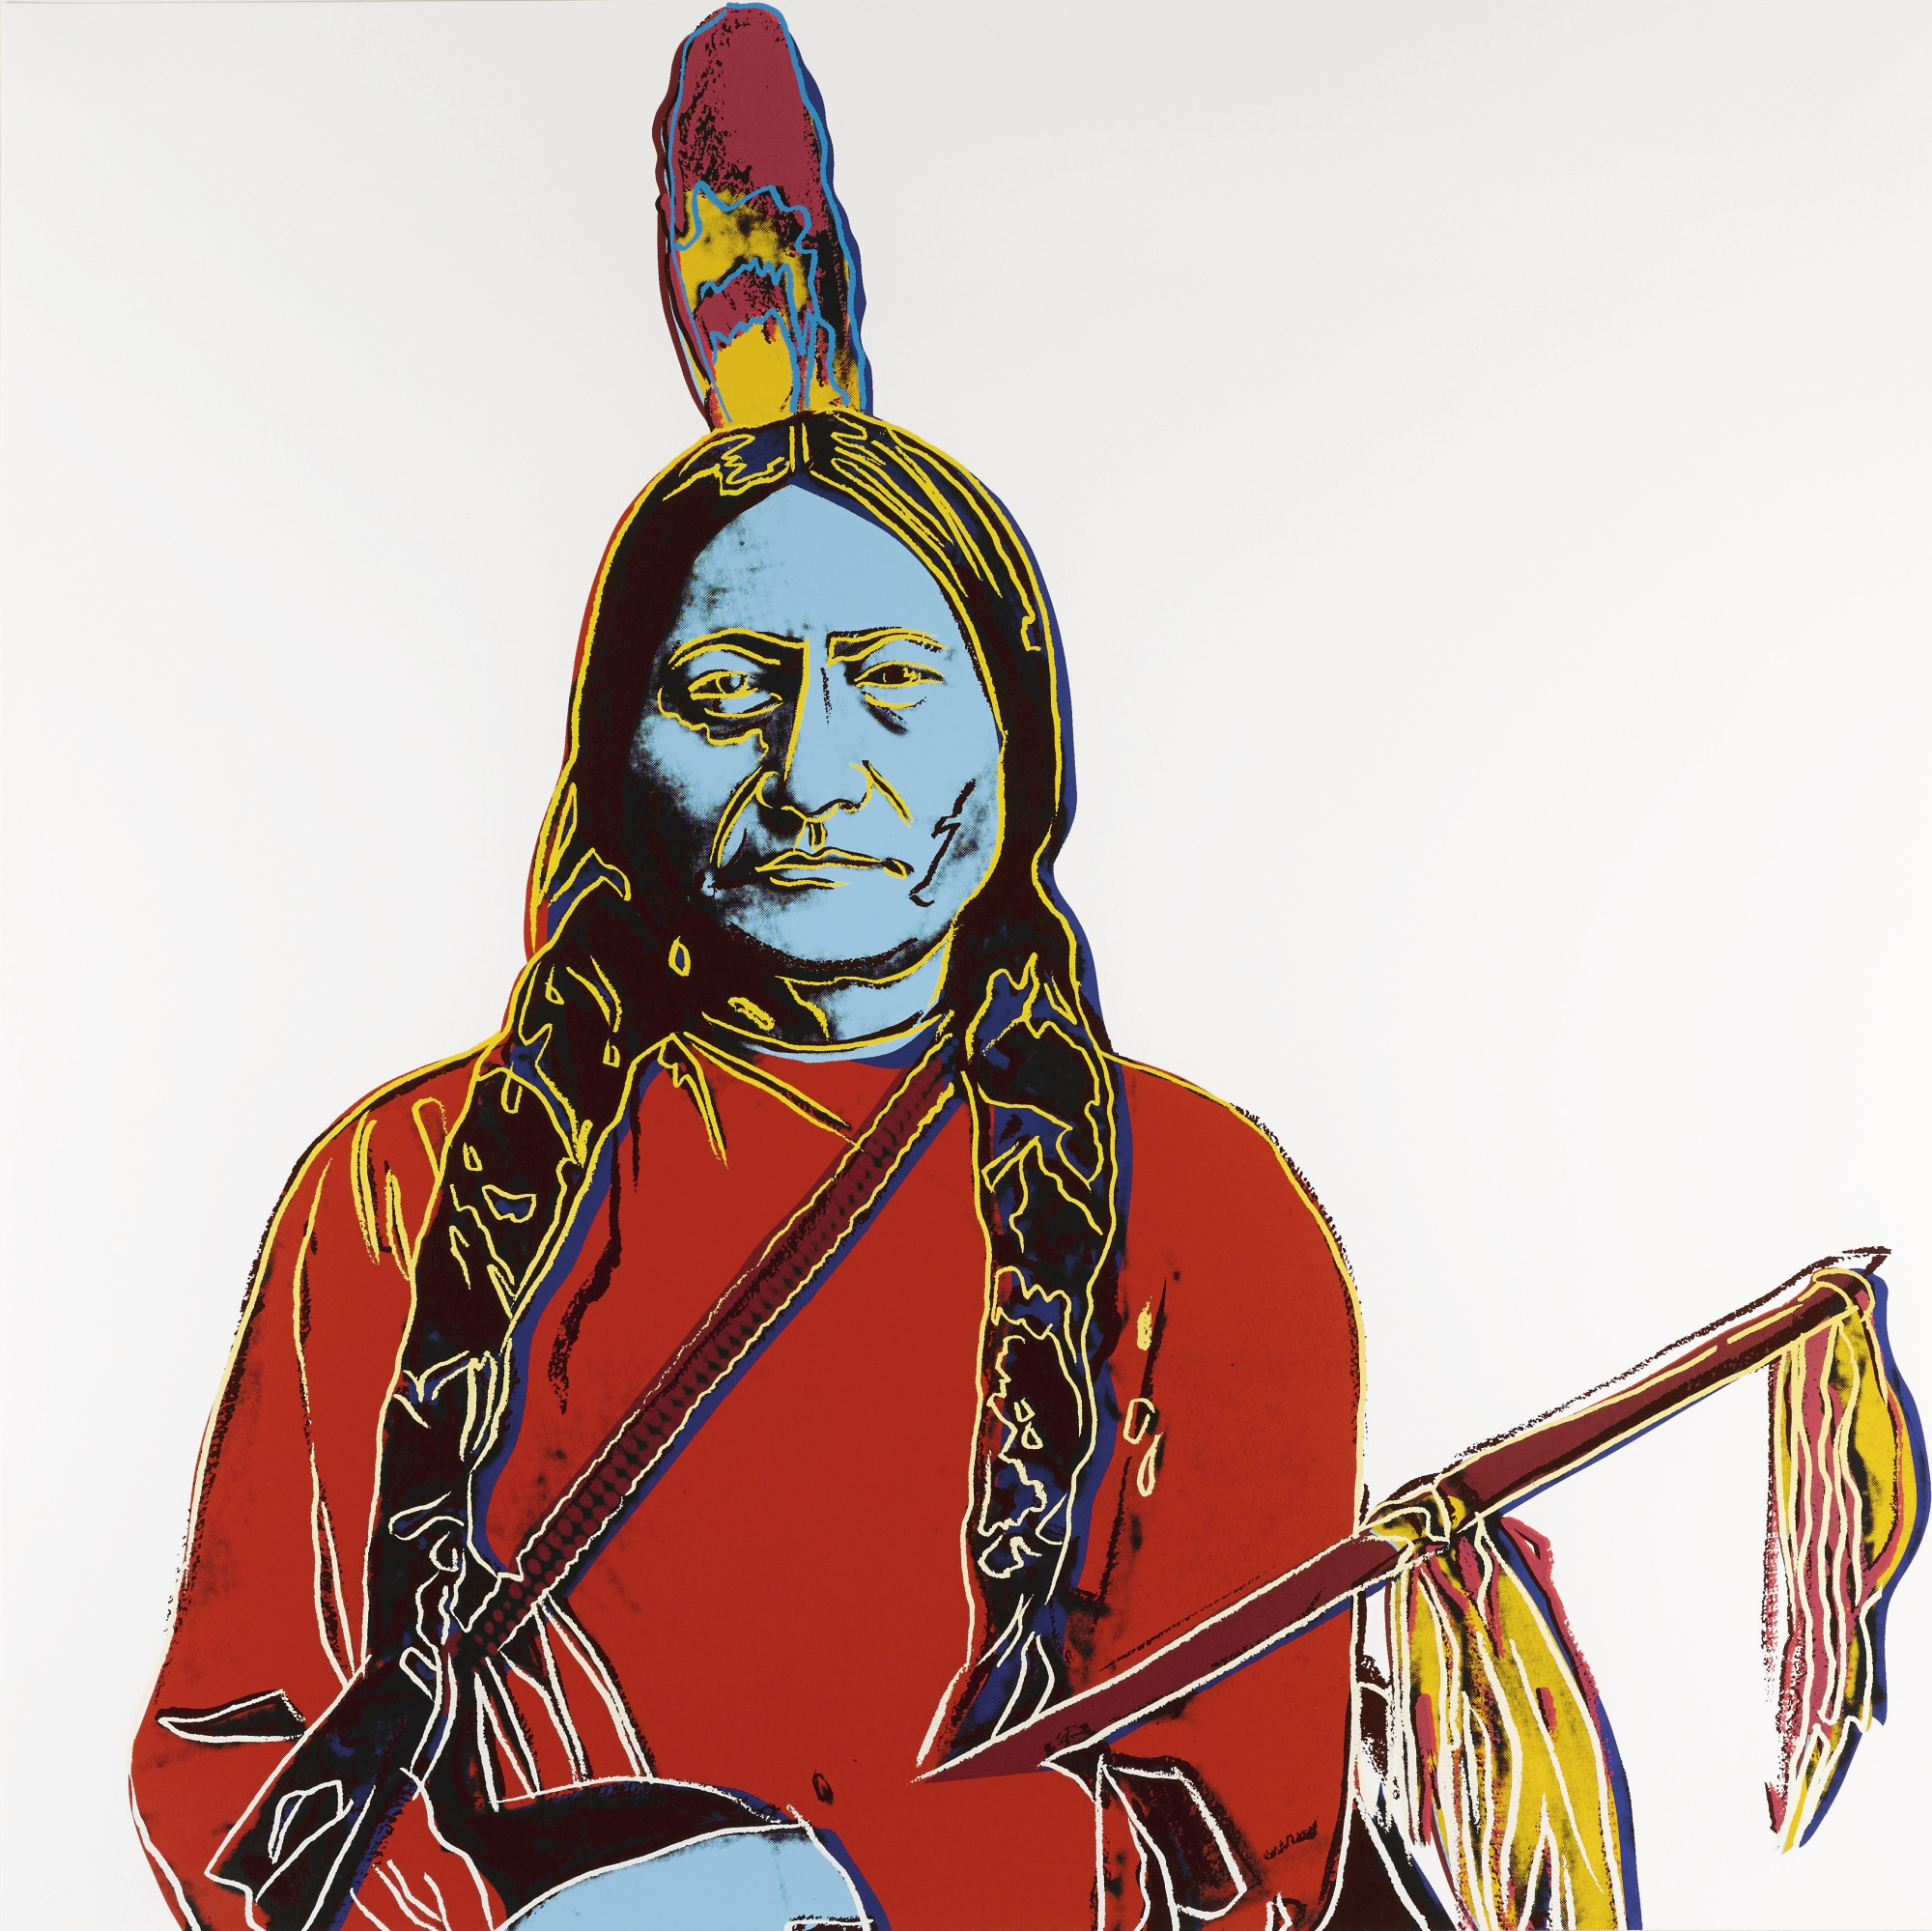 Andy Warhol-Sitting Bull (F. & S. II.376)-1986